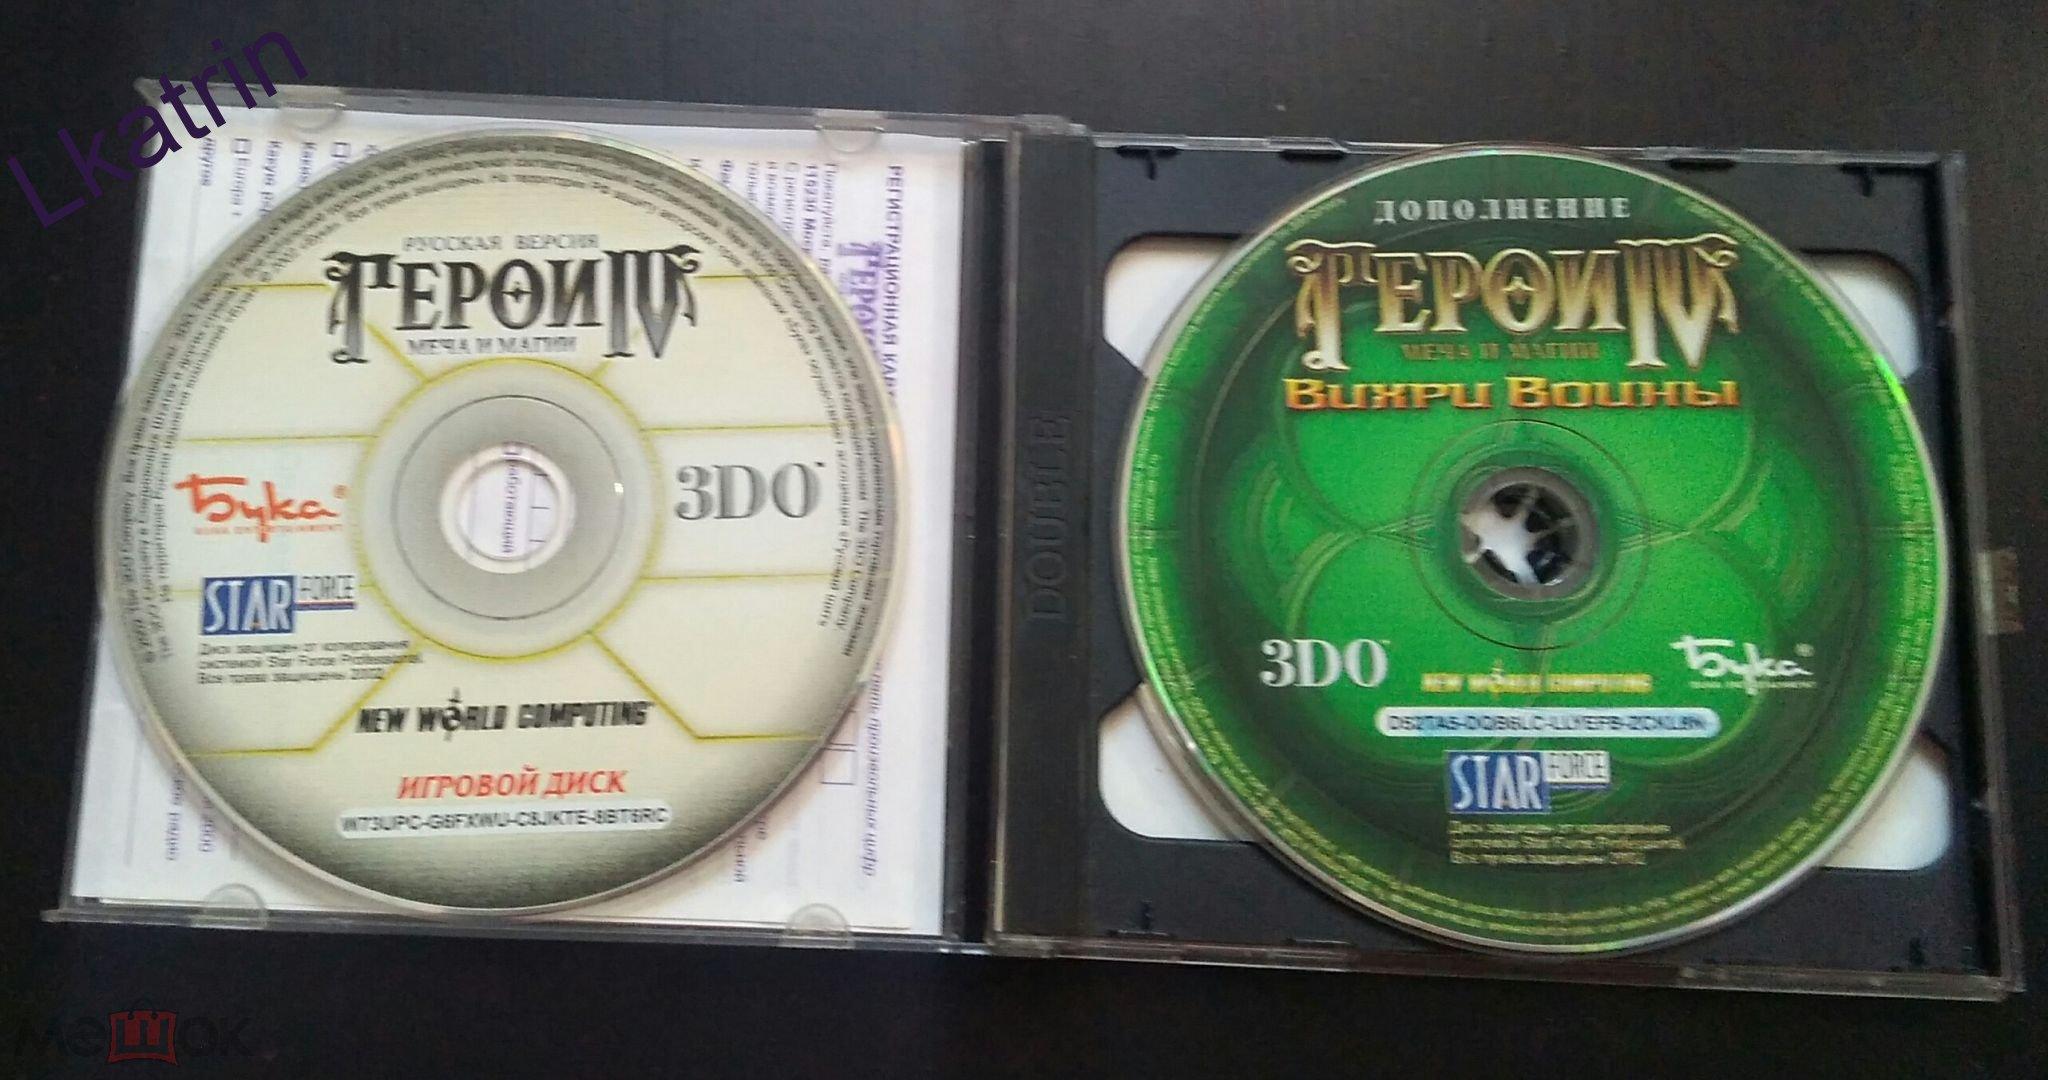 Heroes of might and magic IV. Лицензионное издание.